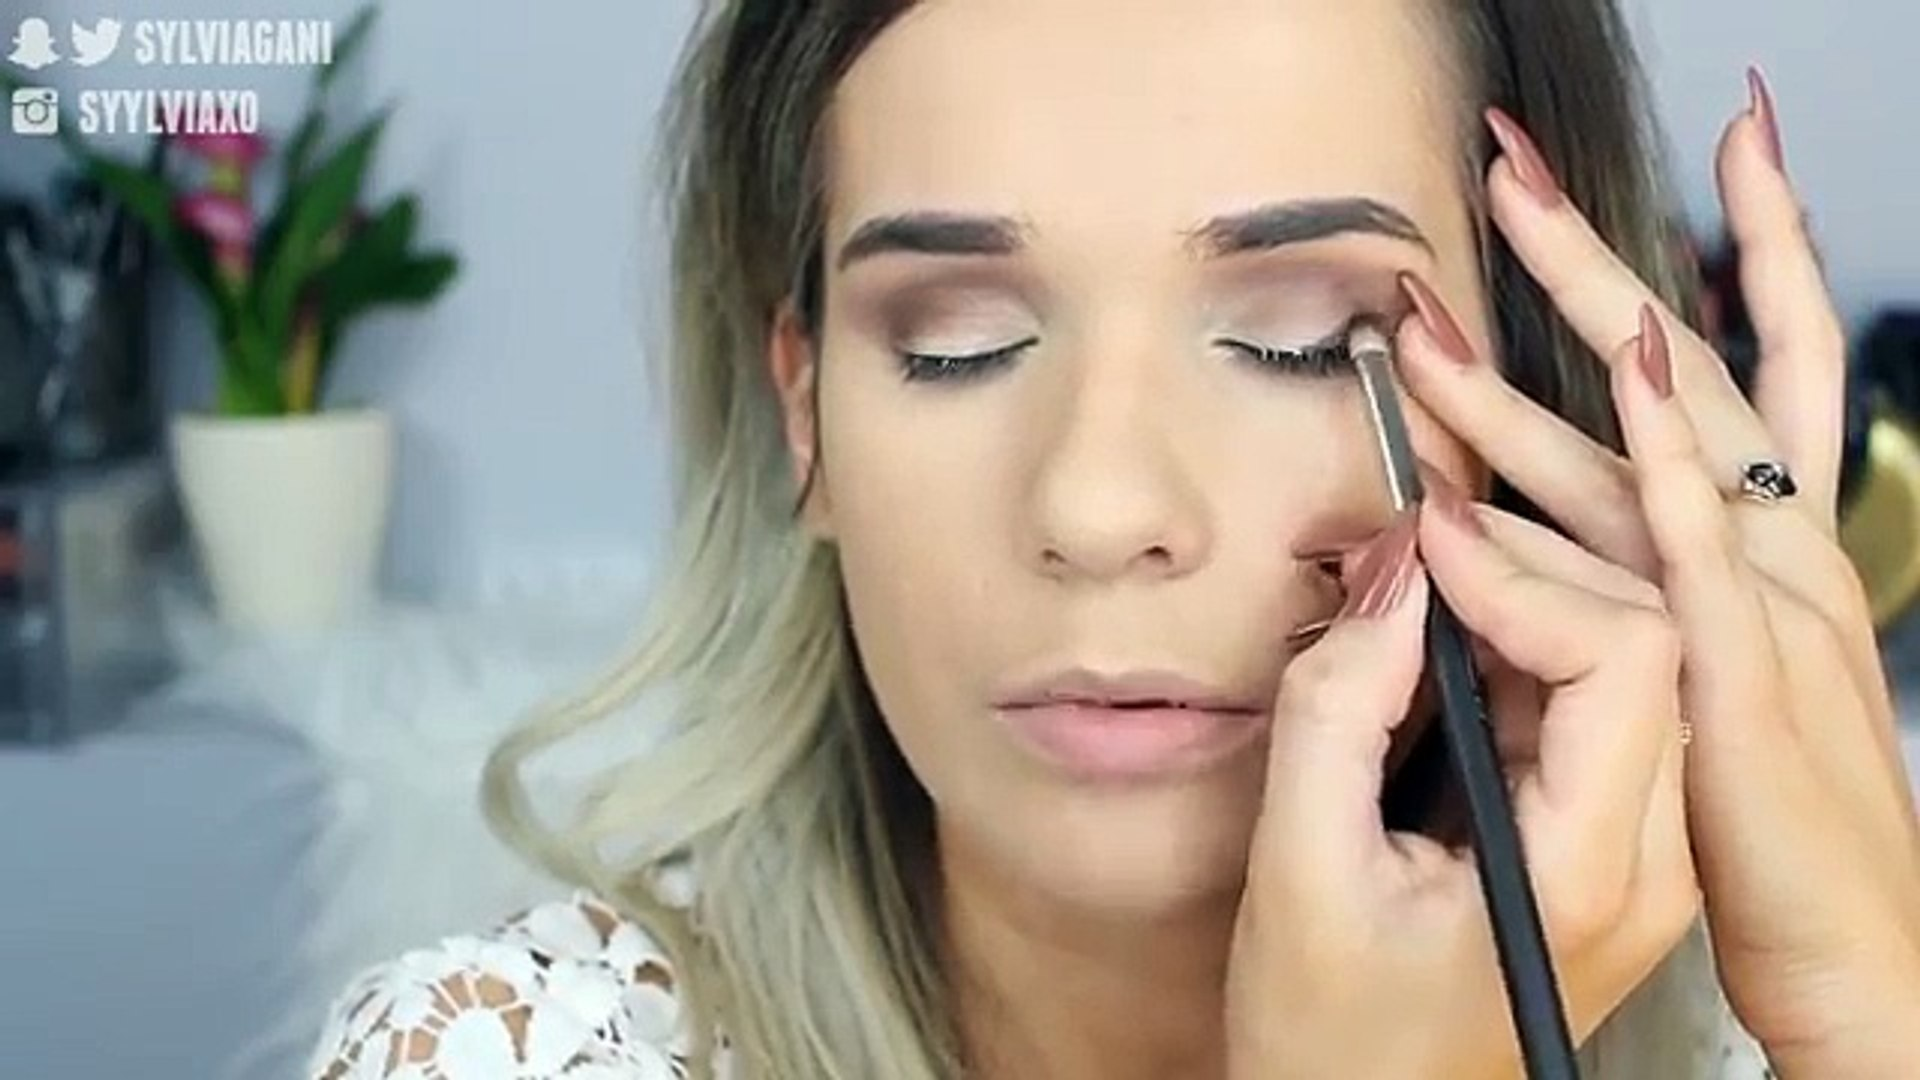 NO MIRROR Makeup Challenge!!   Sylvia Gani